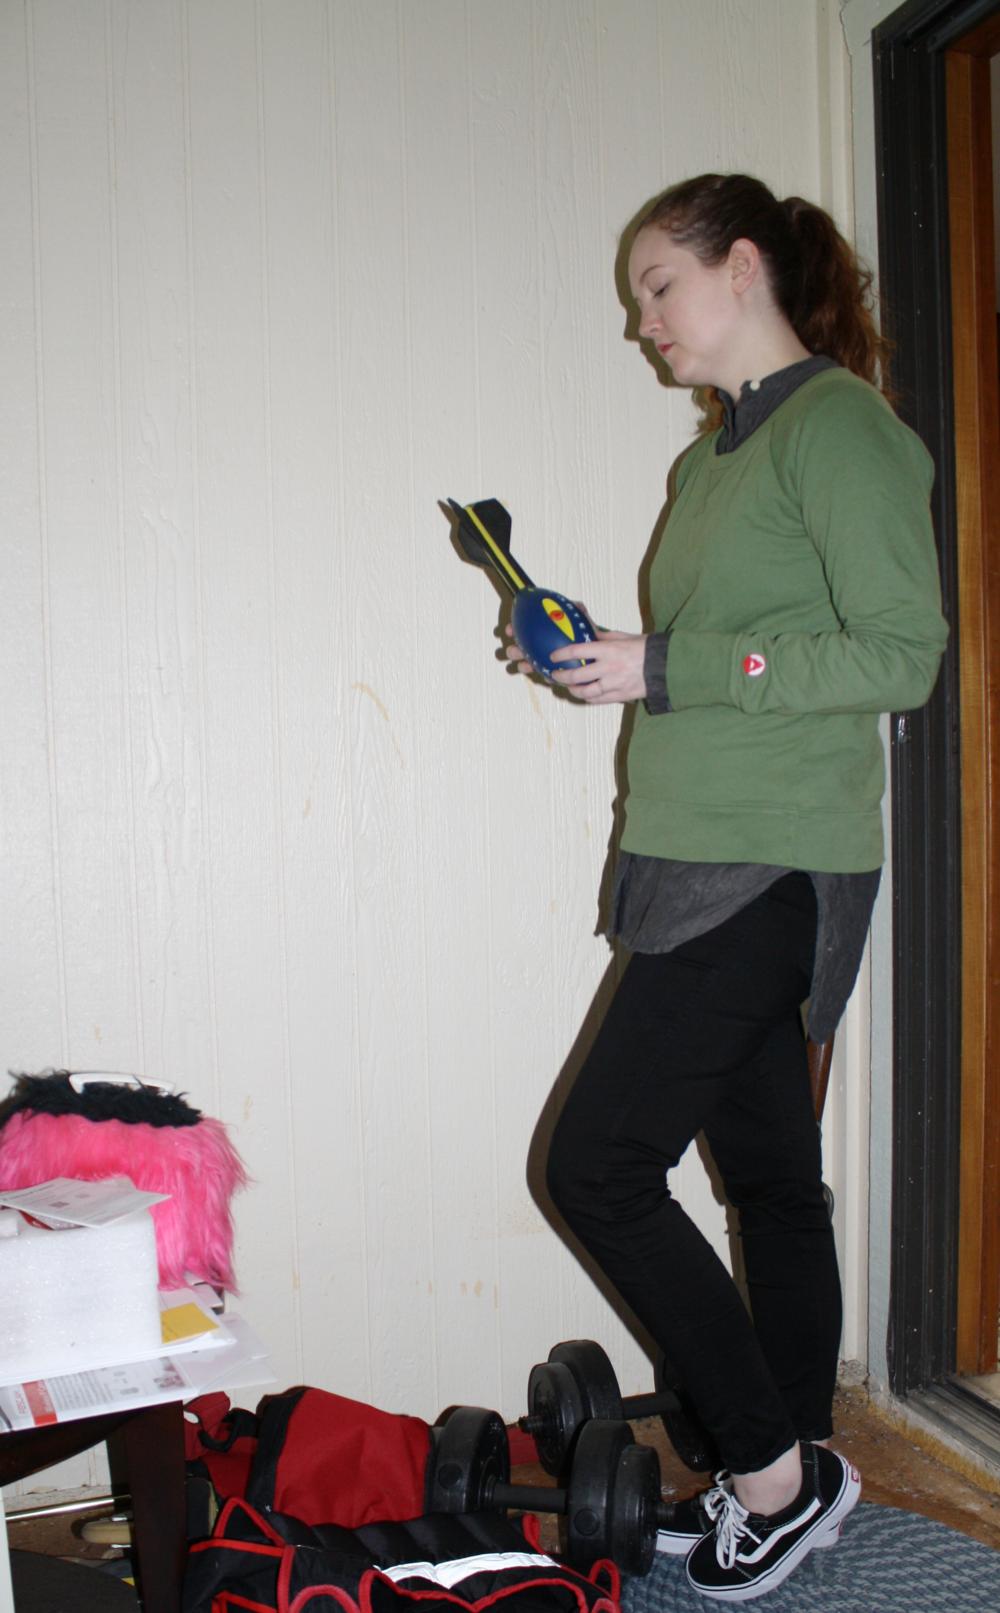 Tradlands Charcoal Tunic + Tradlands Green Sweatshirt +Madewell Black Skinny Jeans + Vans Sneakers